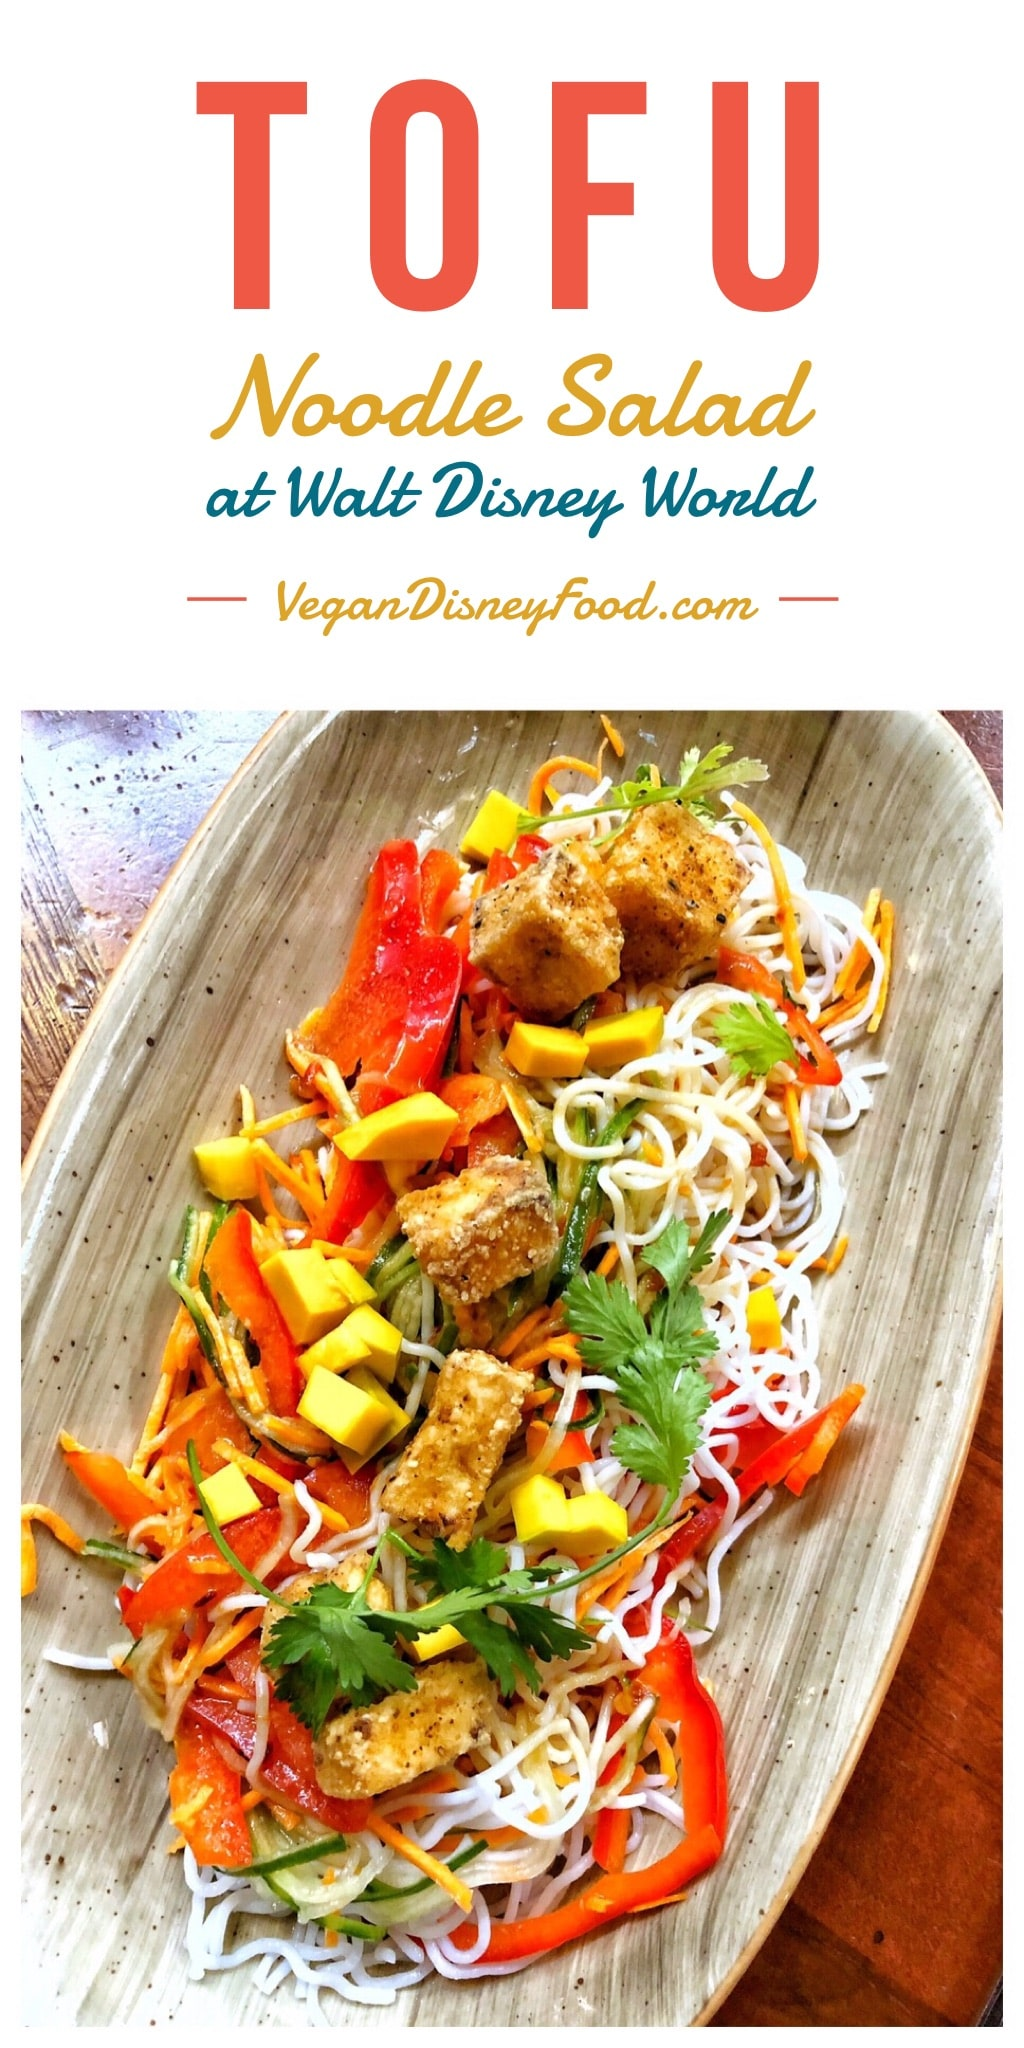 Vegan Tofu Noodle Salad at Kona Cafe in Disney's Polynesian Village Resort at Walt Disney World